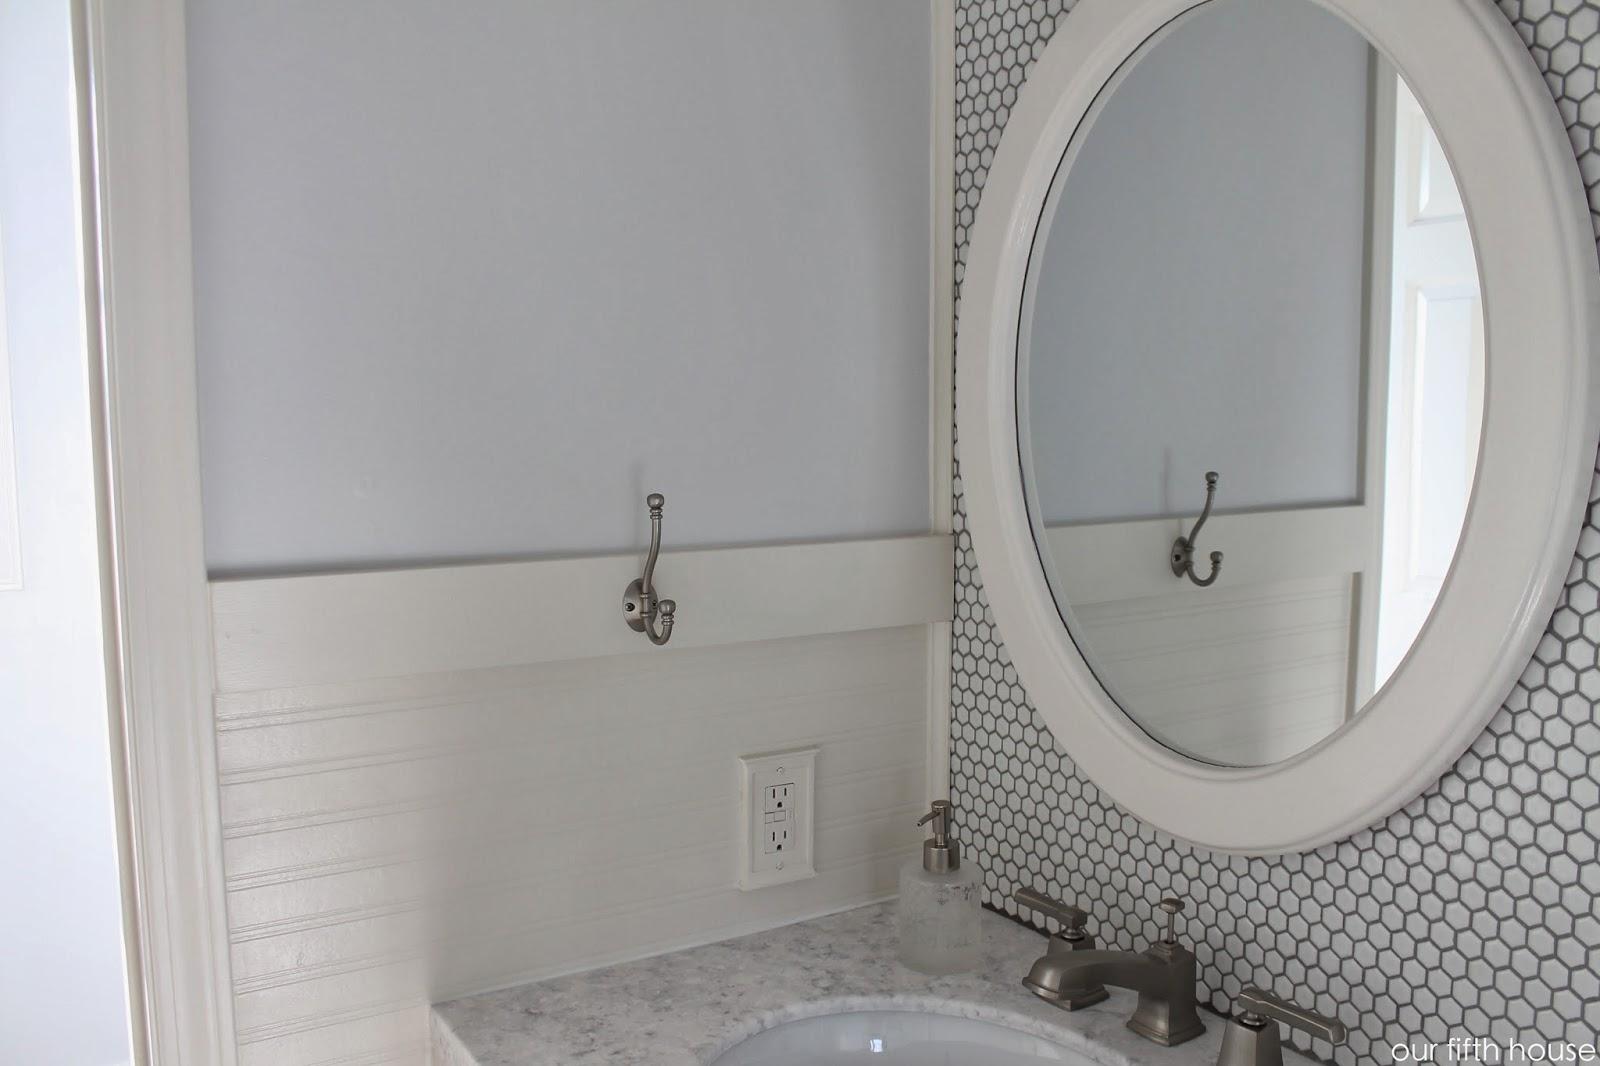 bathroom tile wall, beadboard wall paper and hooks